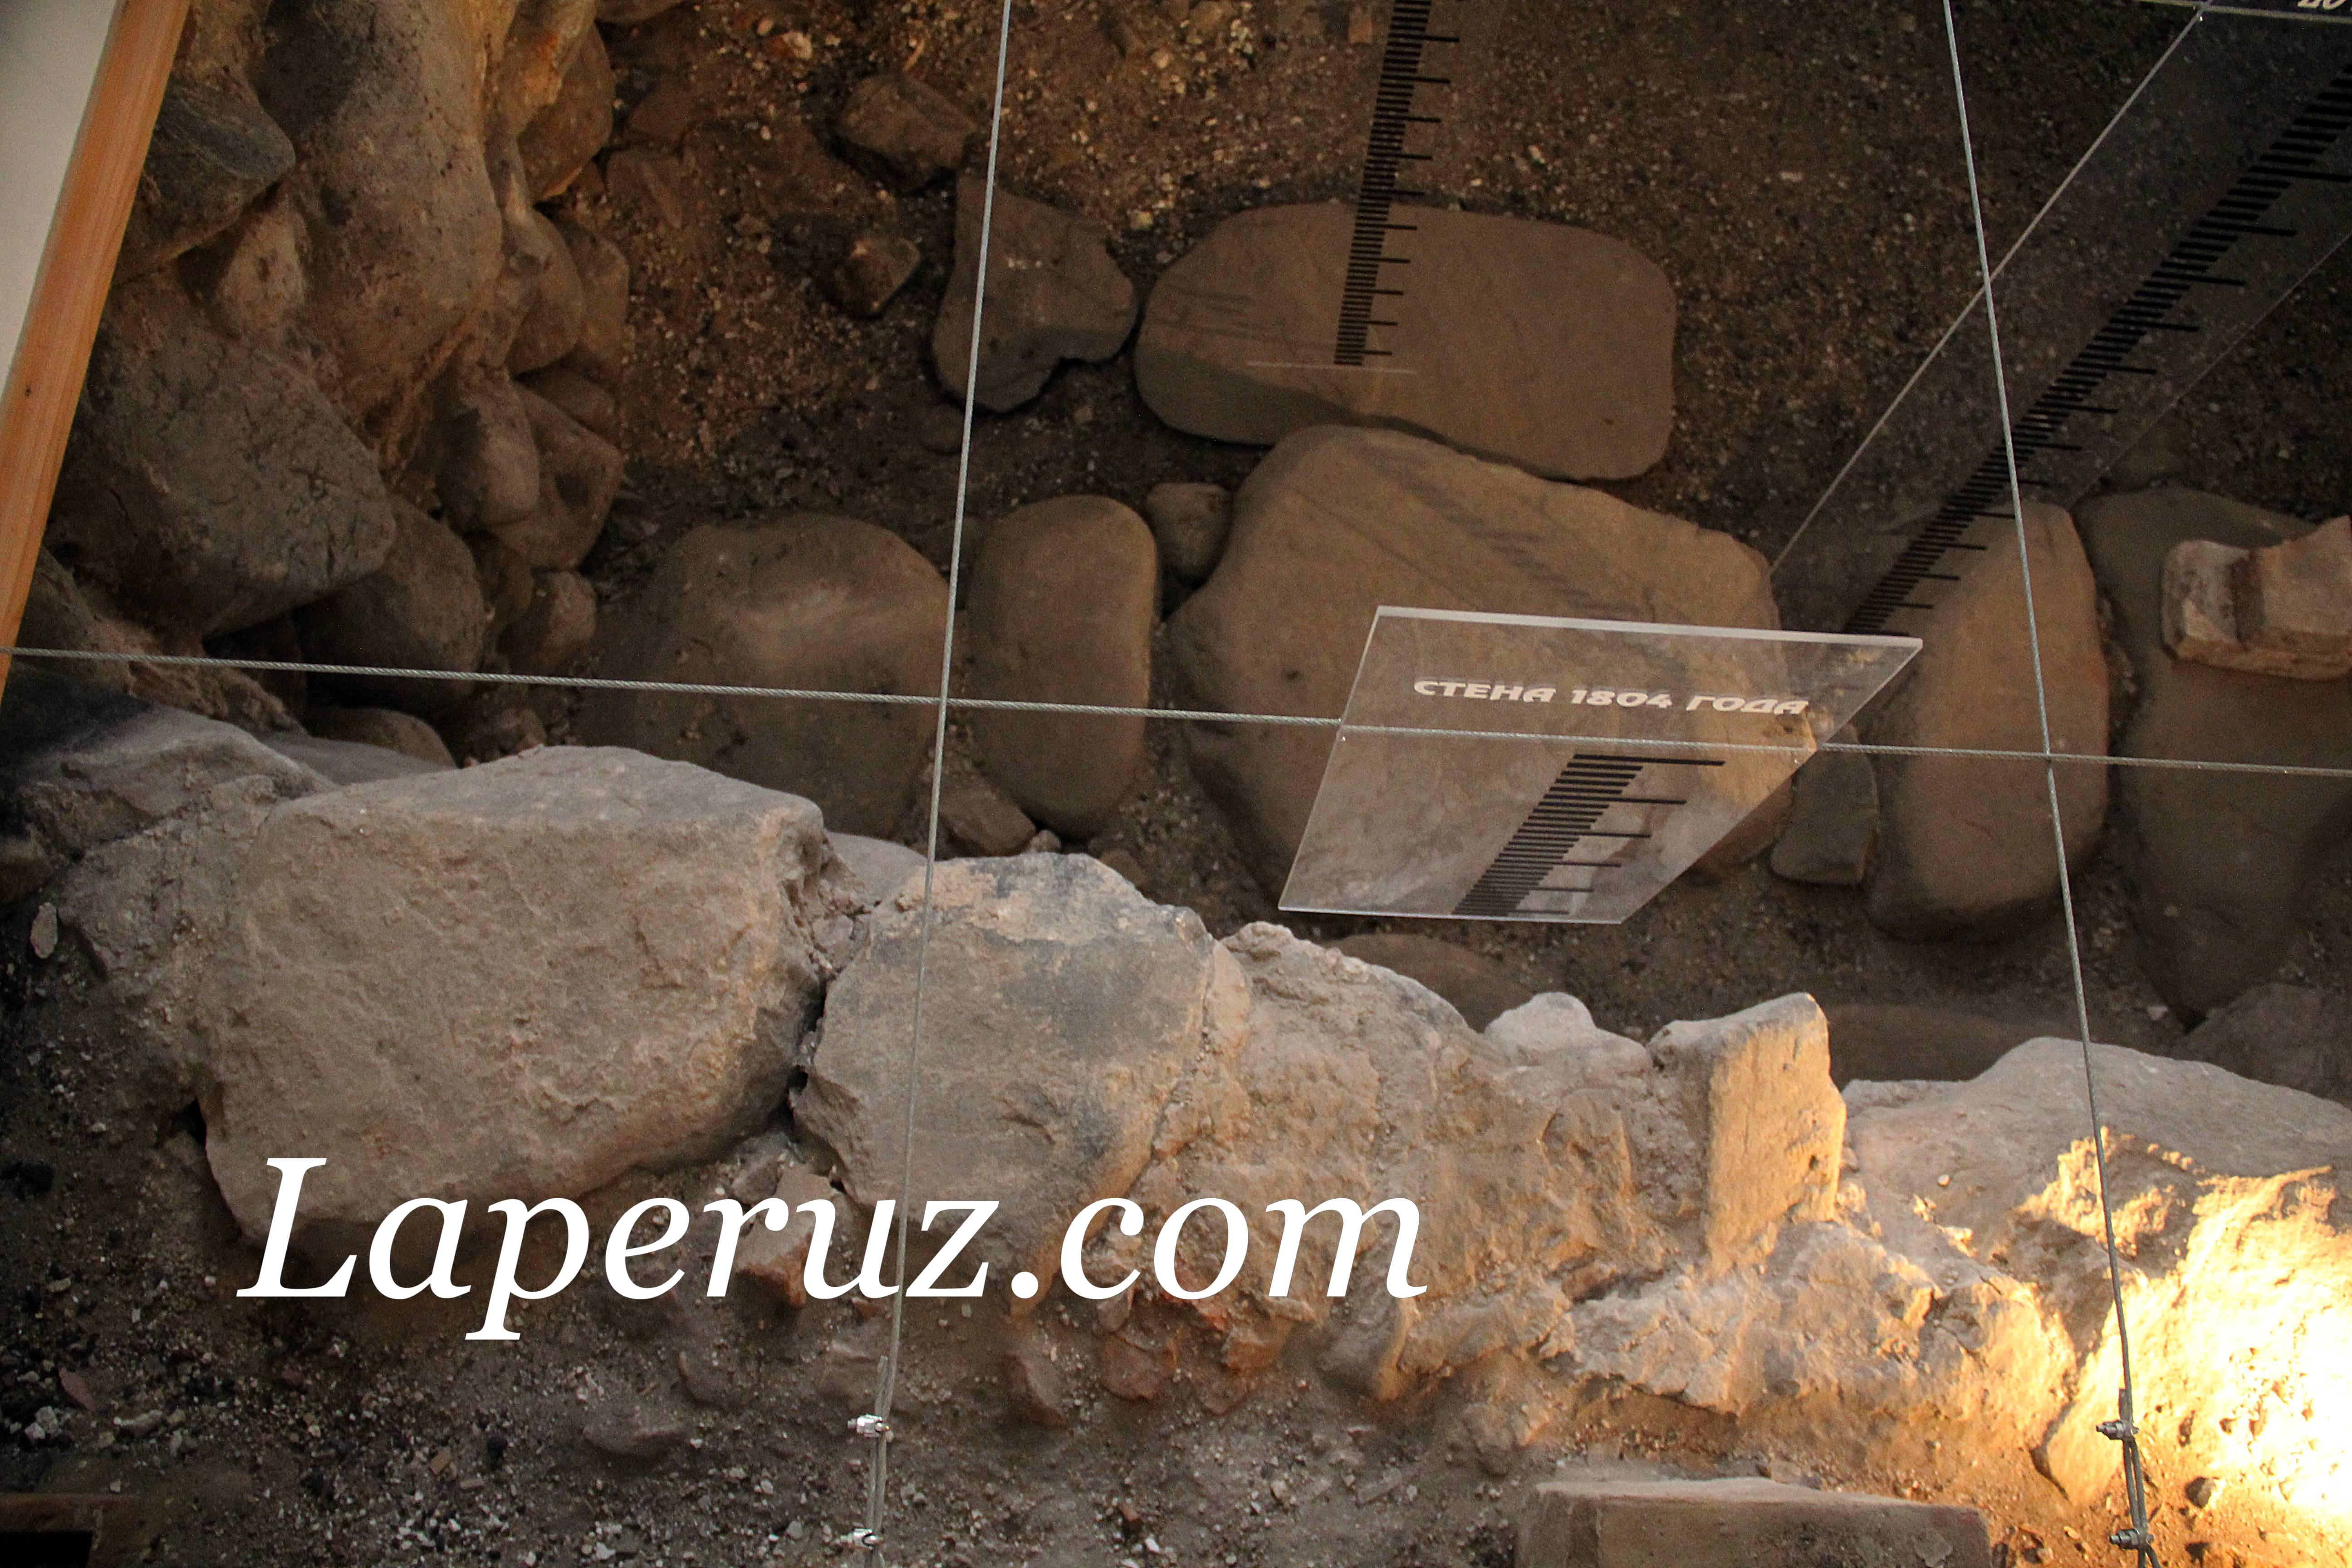 arheologicheskii_muzei_solovki_fundament_5